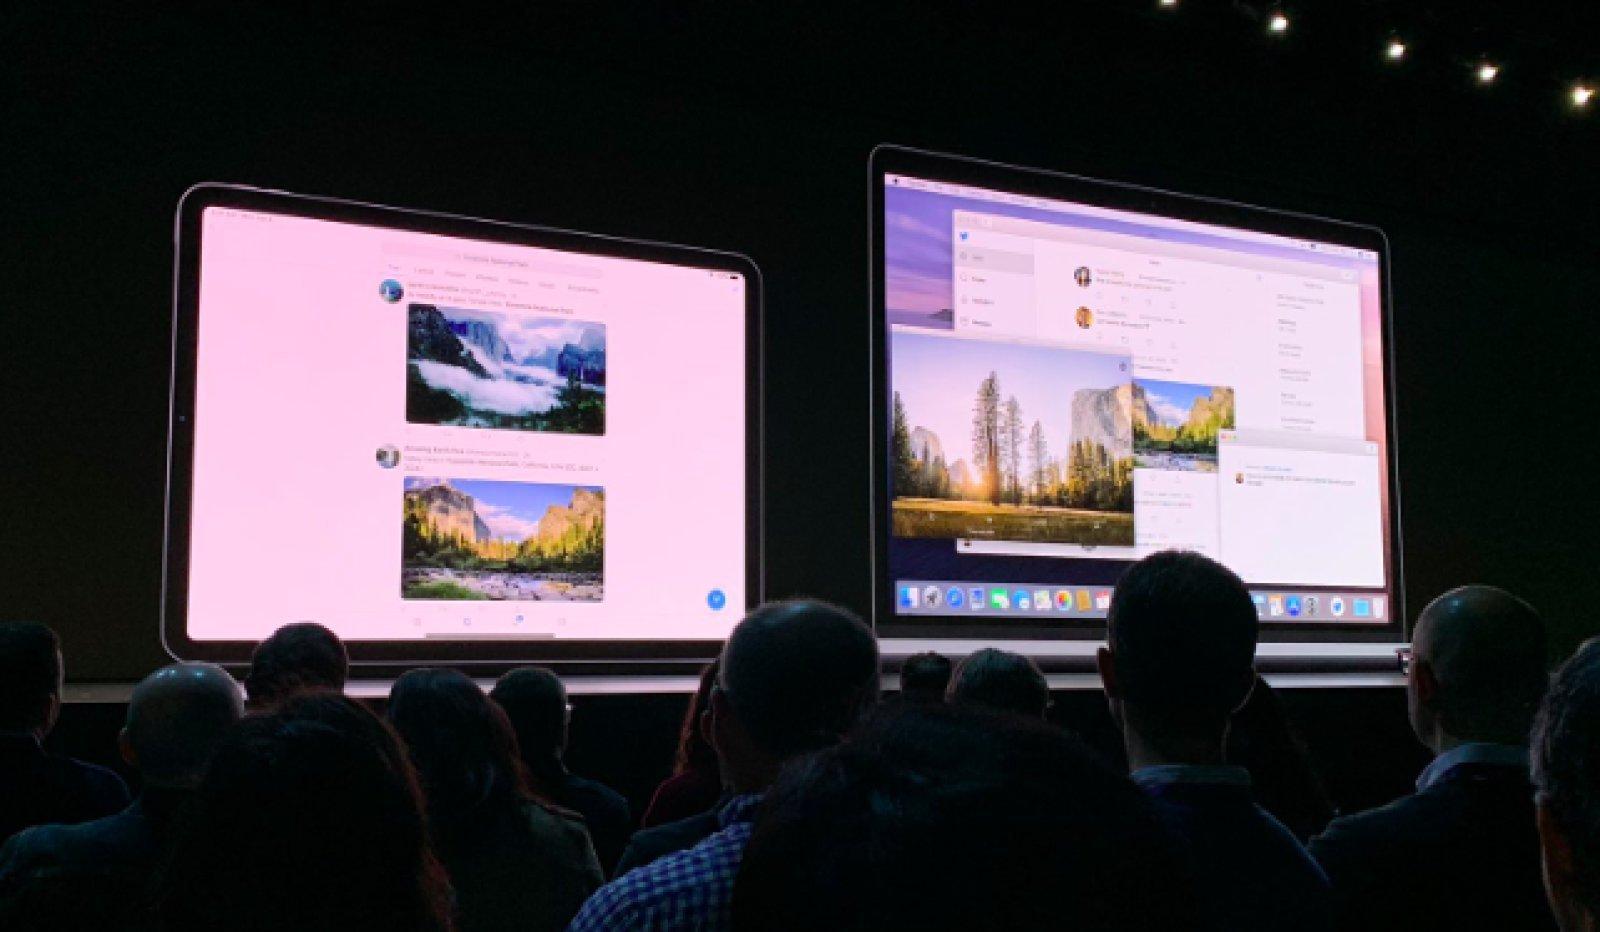 Twitter app macOS 10.15 Catalina